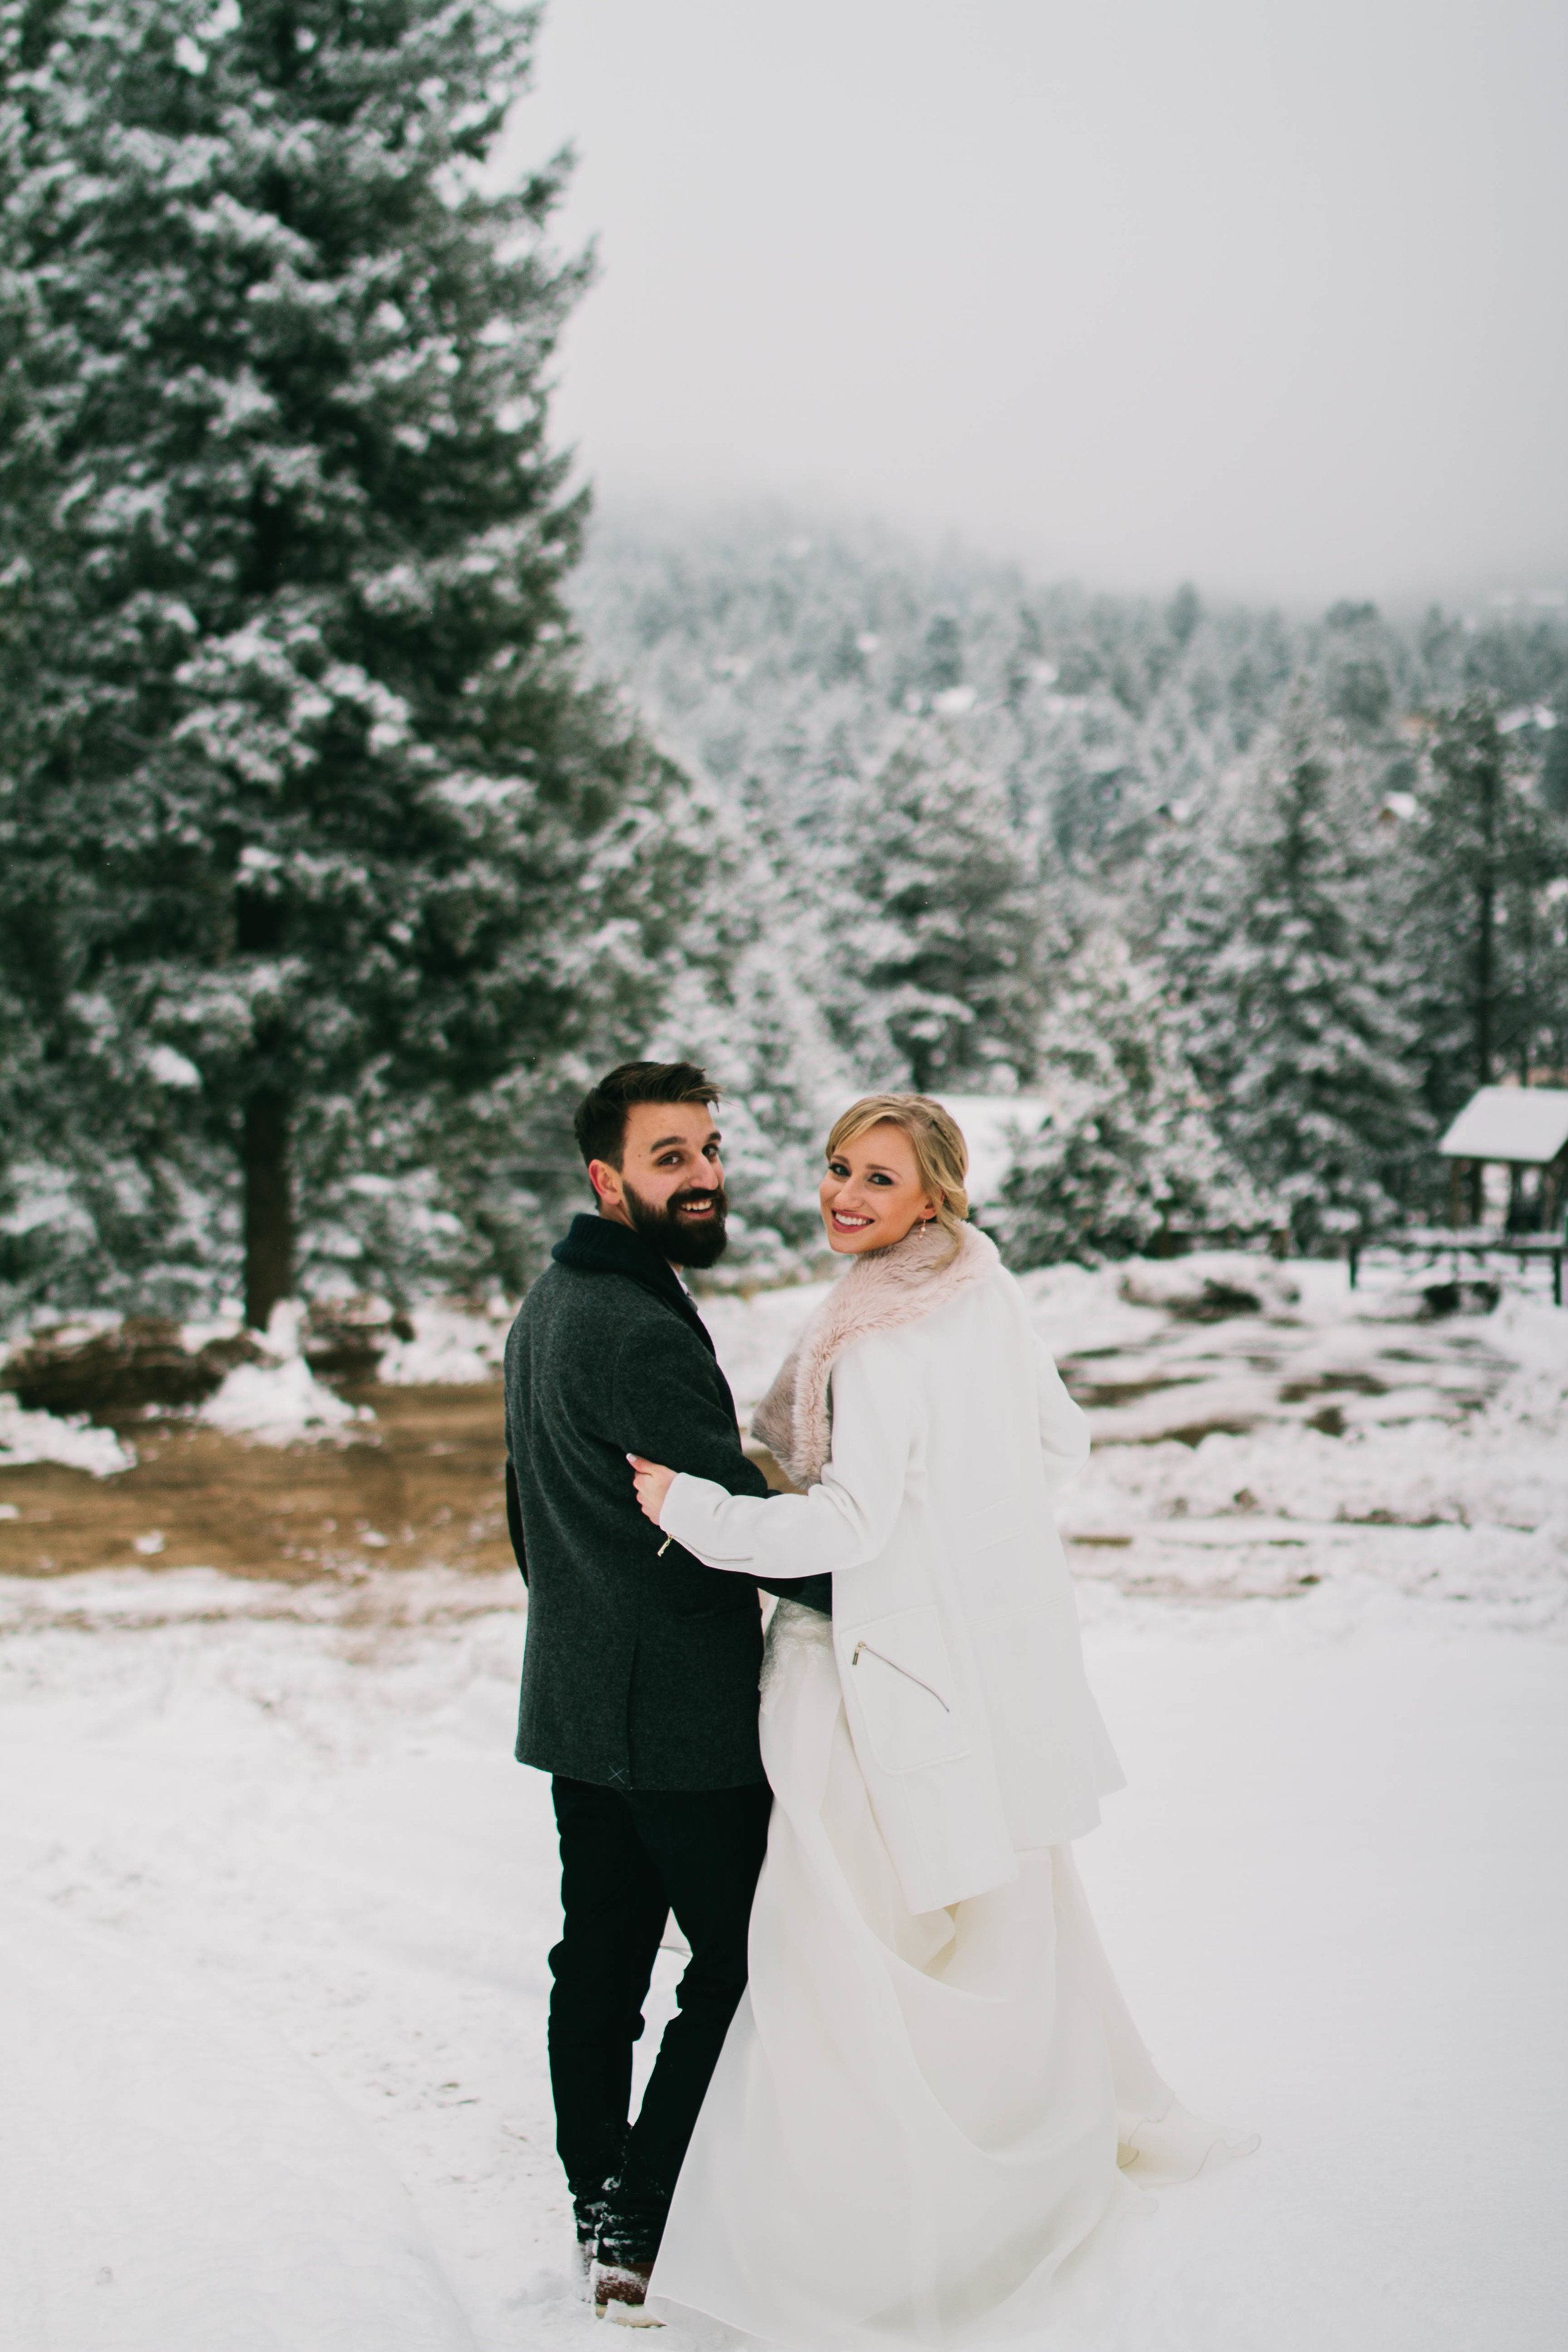 Bonin Wedding - Madeleine Bonin Photography-5838.jpg